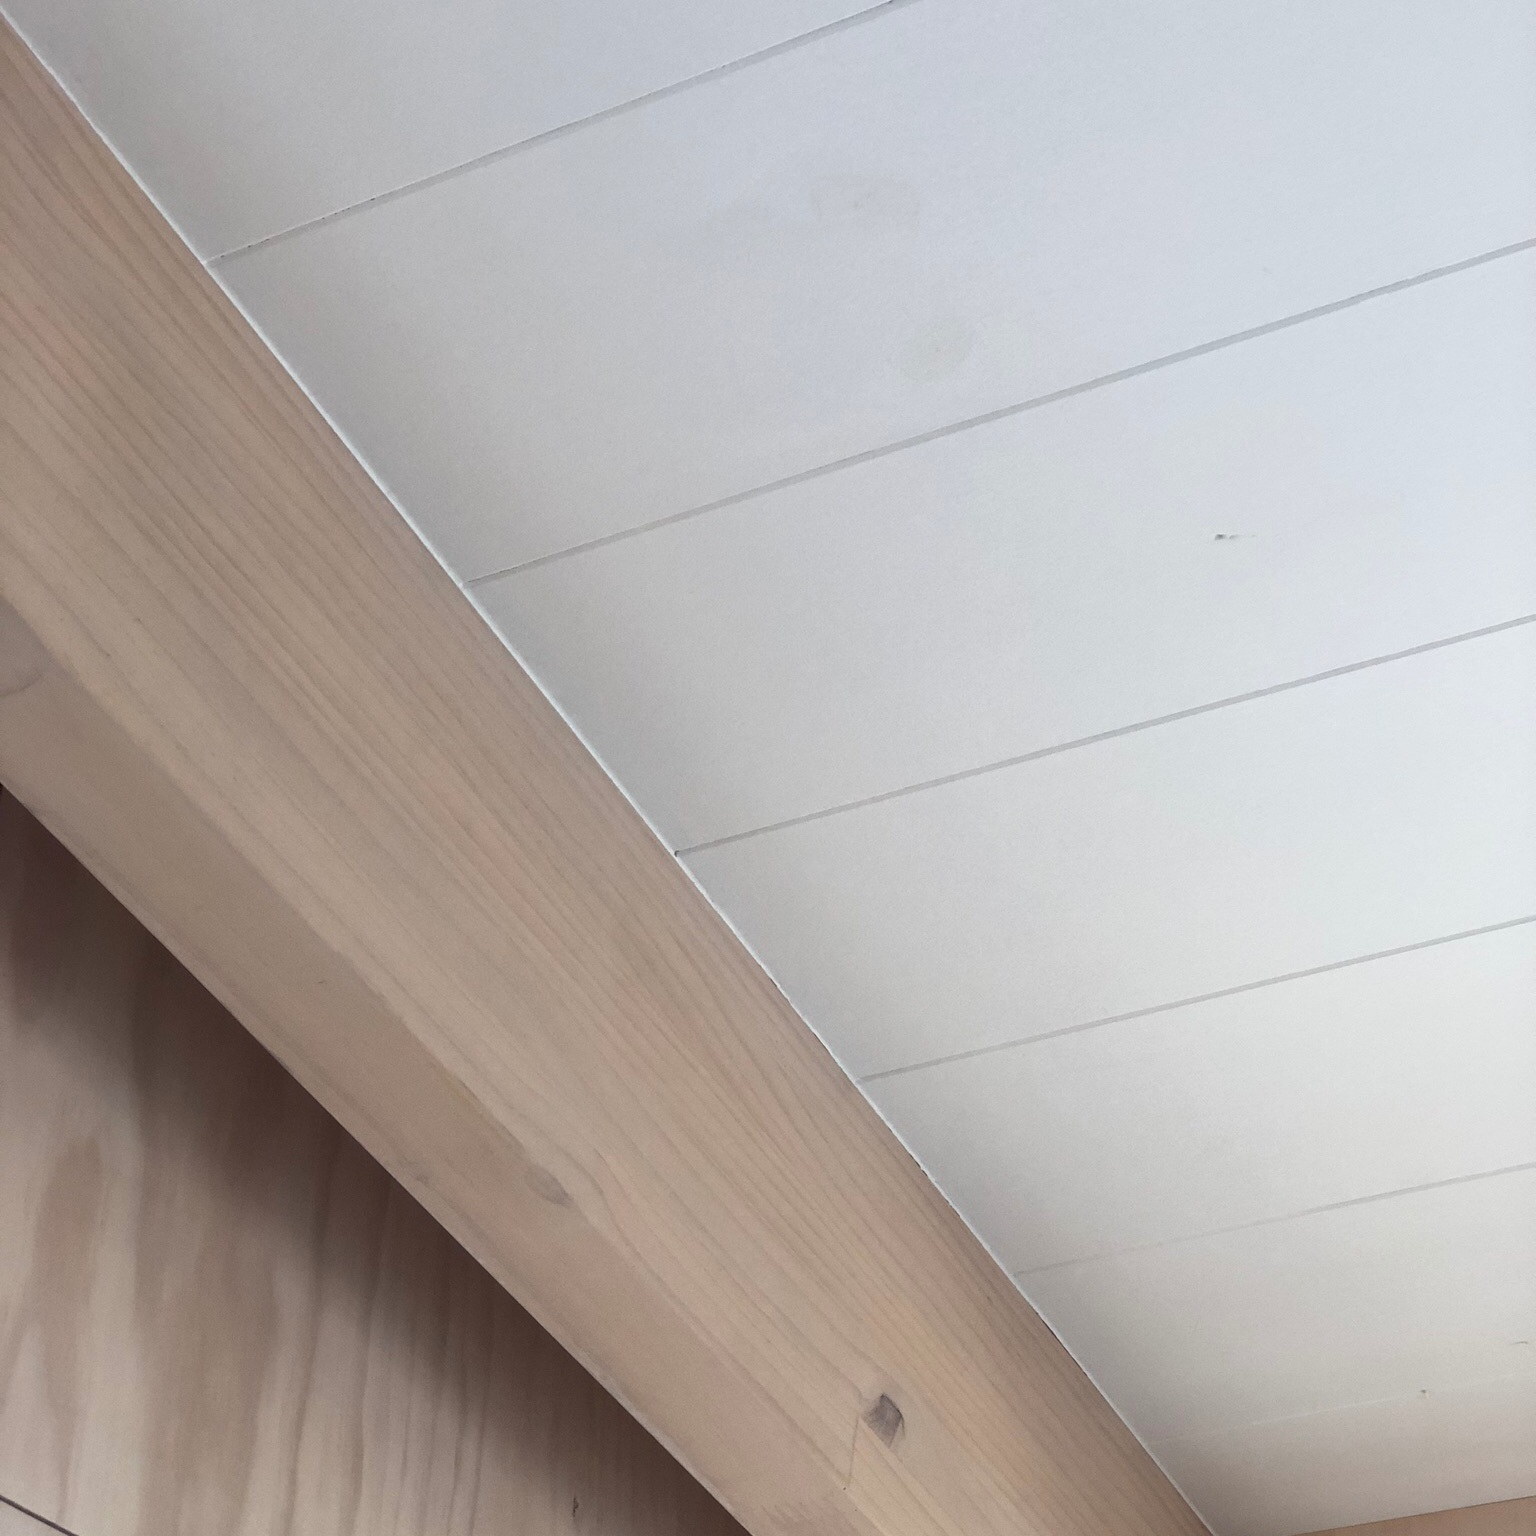 interior+ceiling+detail+.jpg